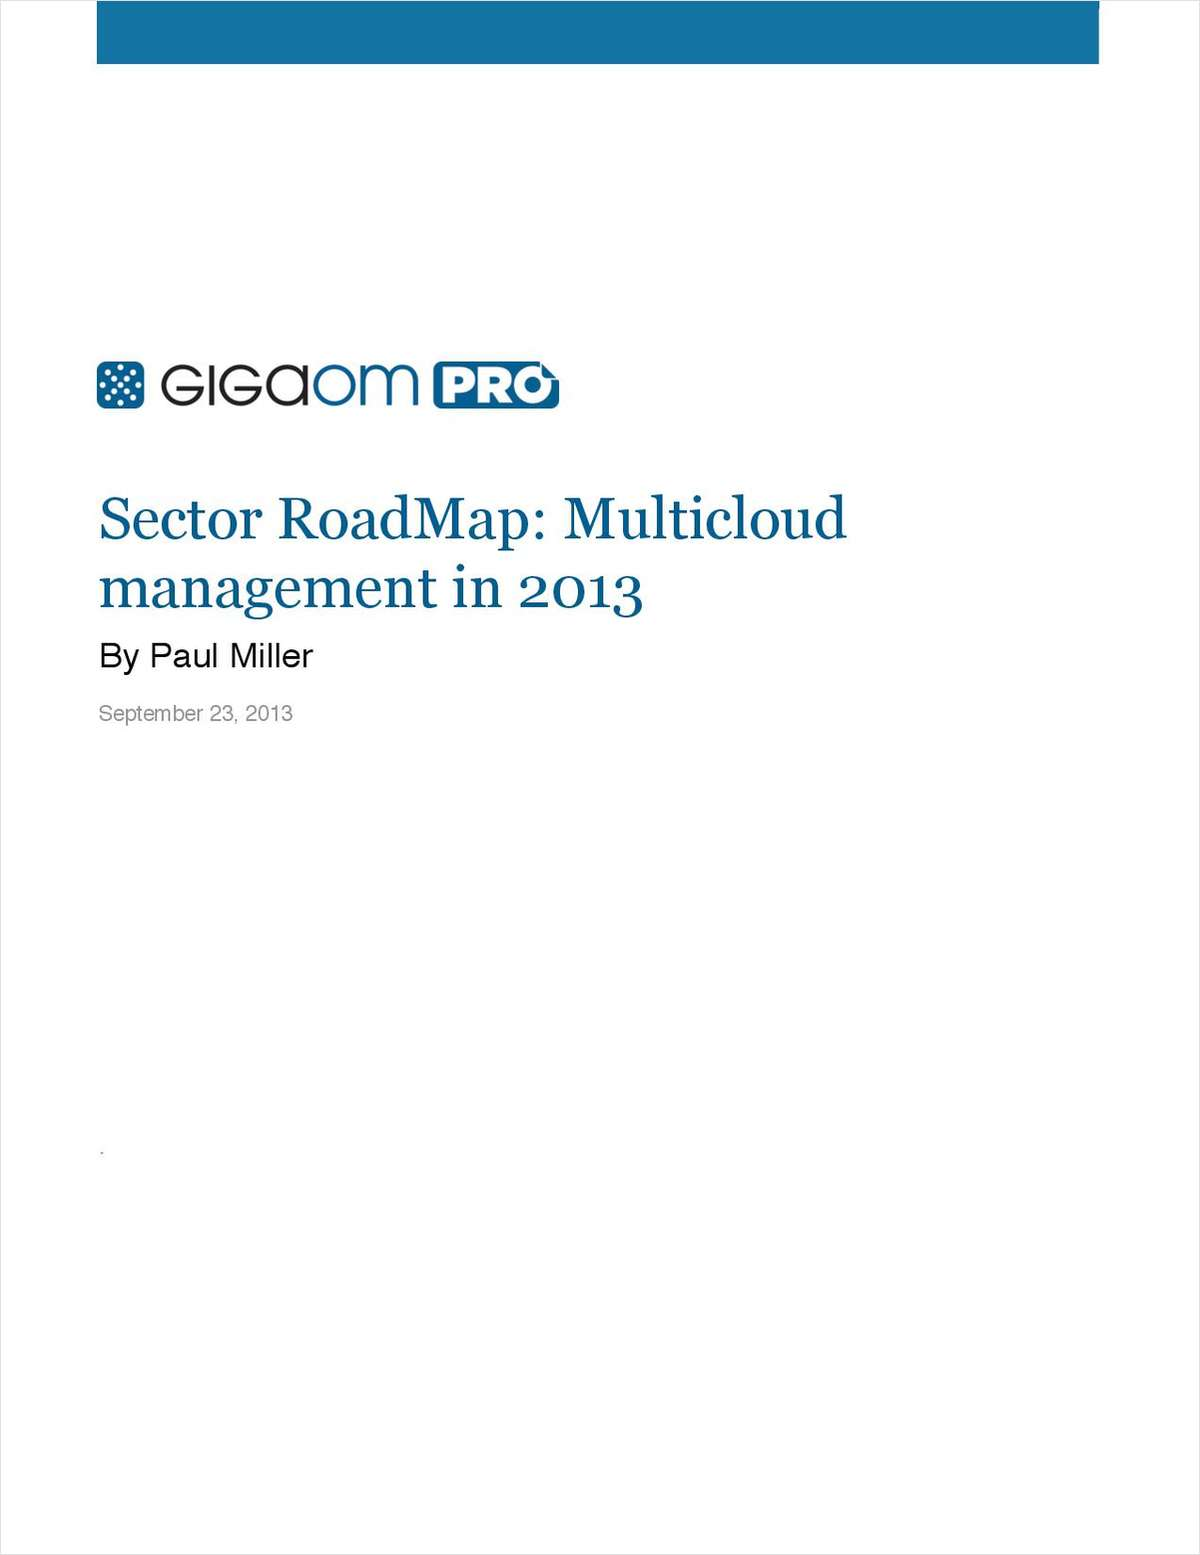 Multicloud Management - GigaOM's